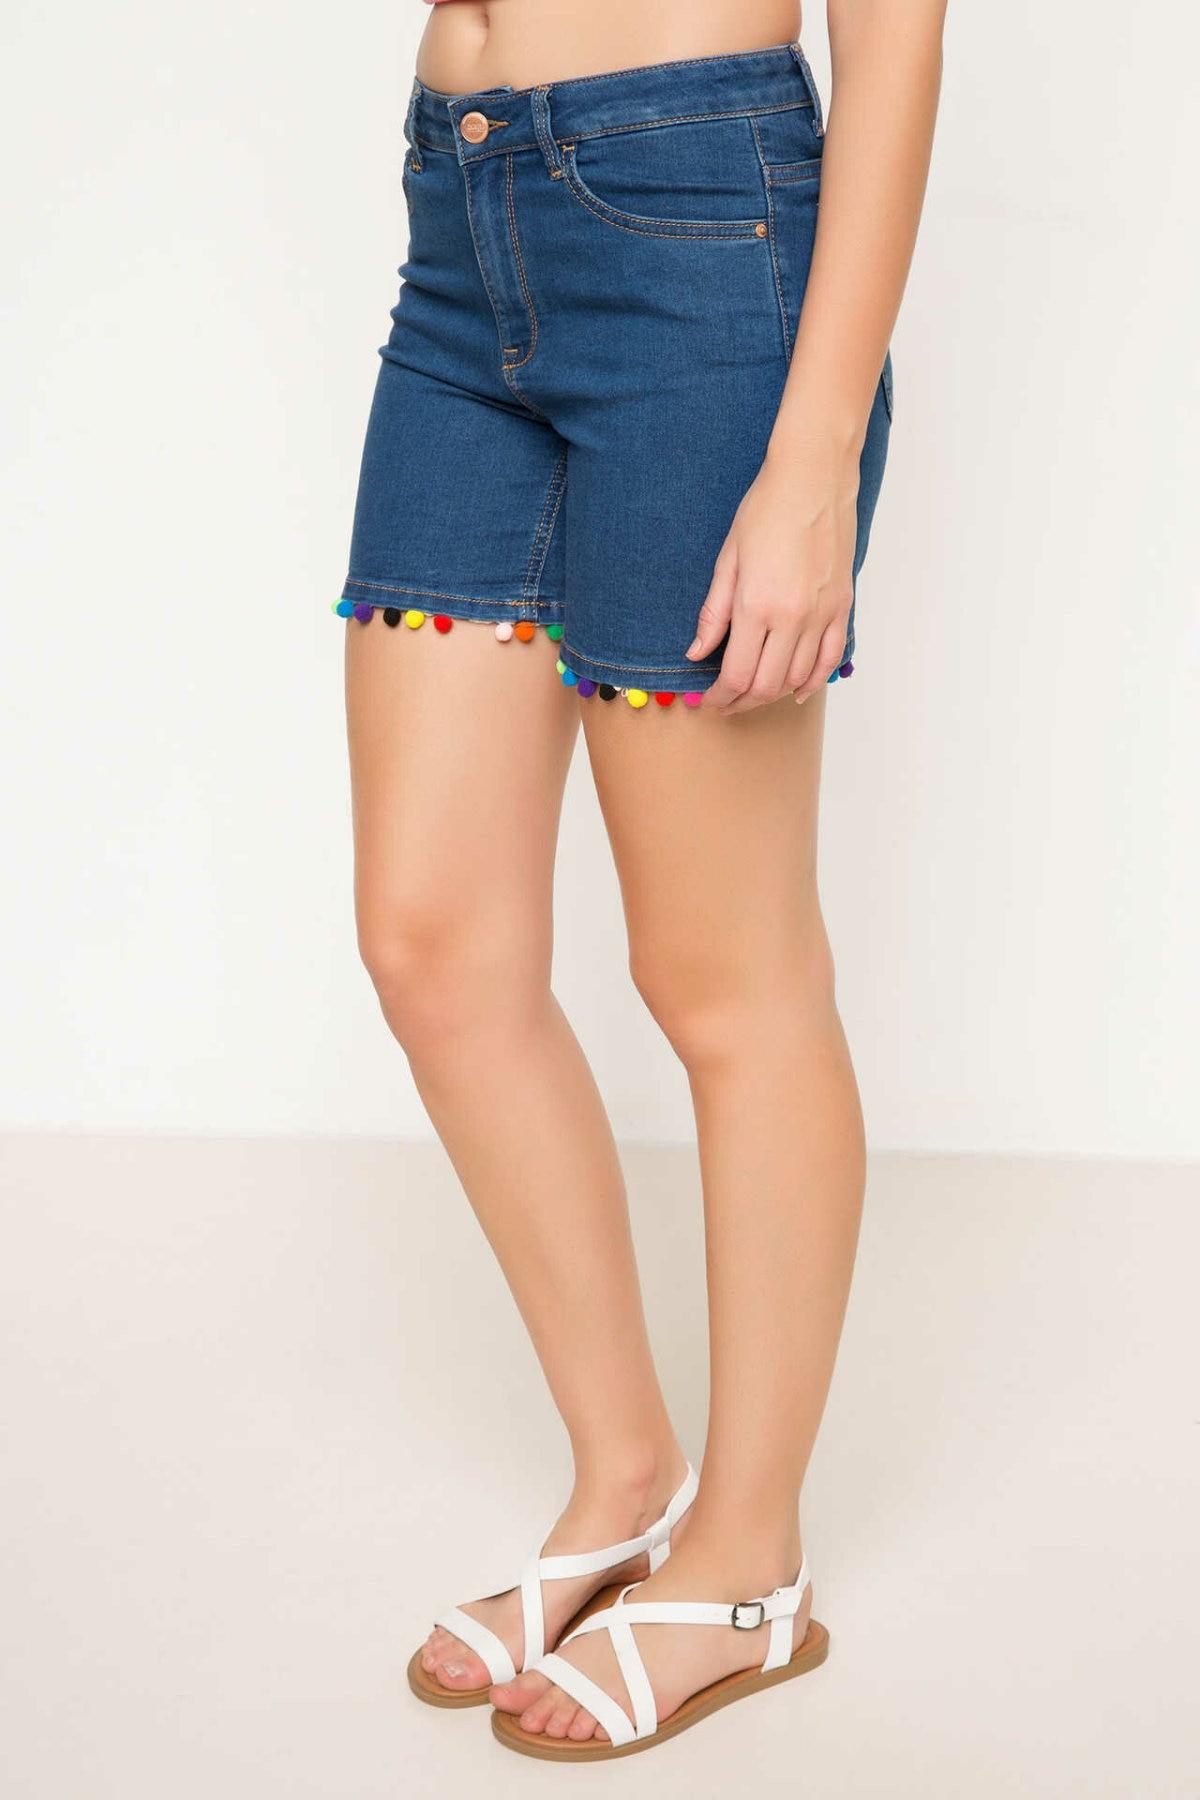 DeFacto Fashion Women Blue High Waist Slim Short Female Casual Simple Short Simple Hole Button Bottoms New - H8463AZ17HS